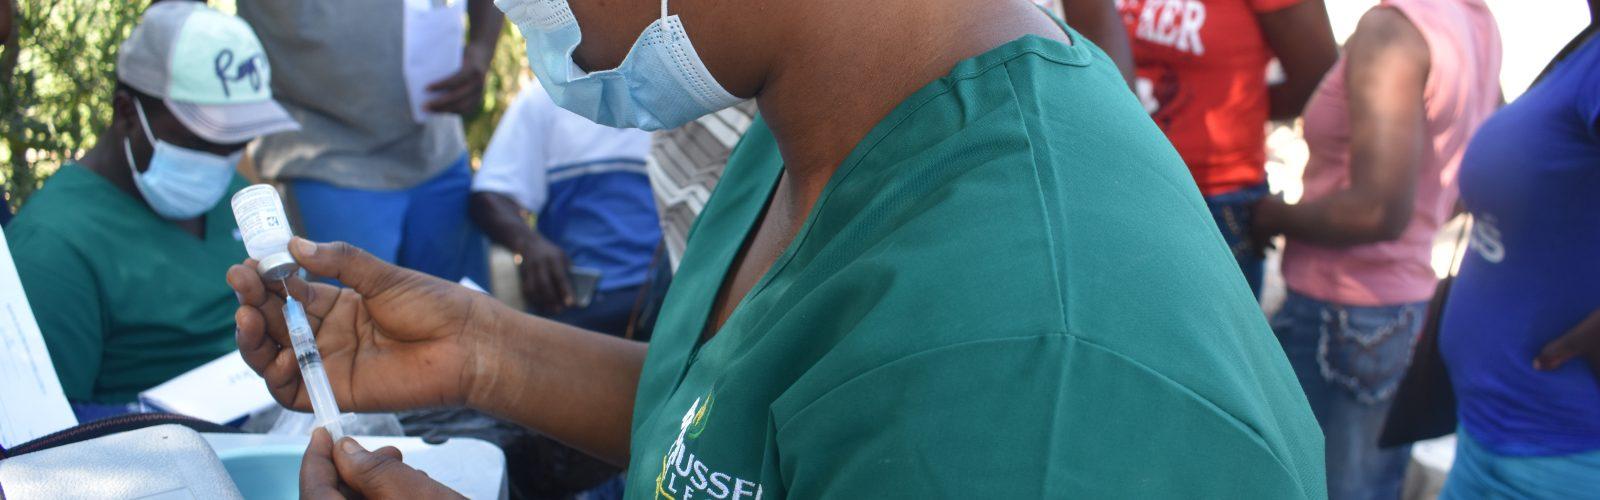 HAS staff fills COVID vaccine syringe